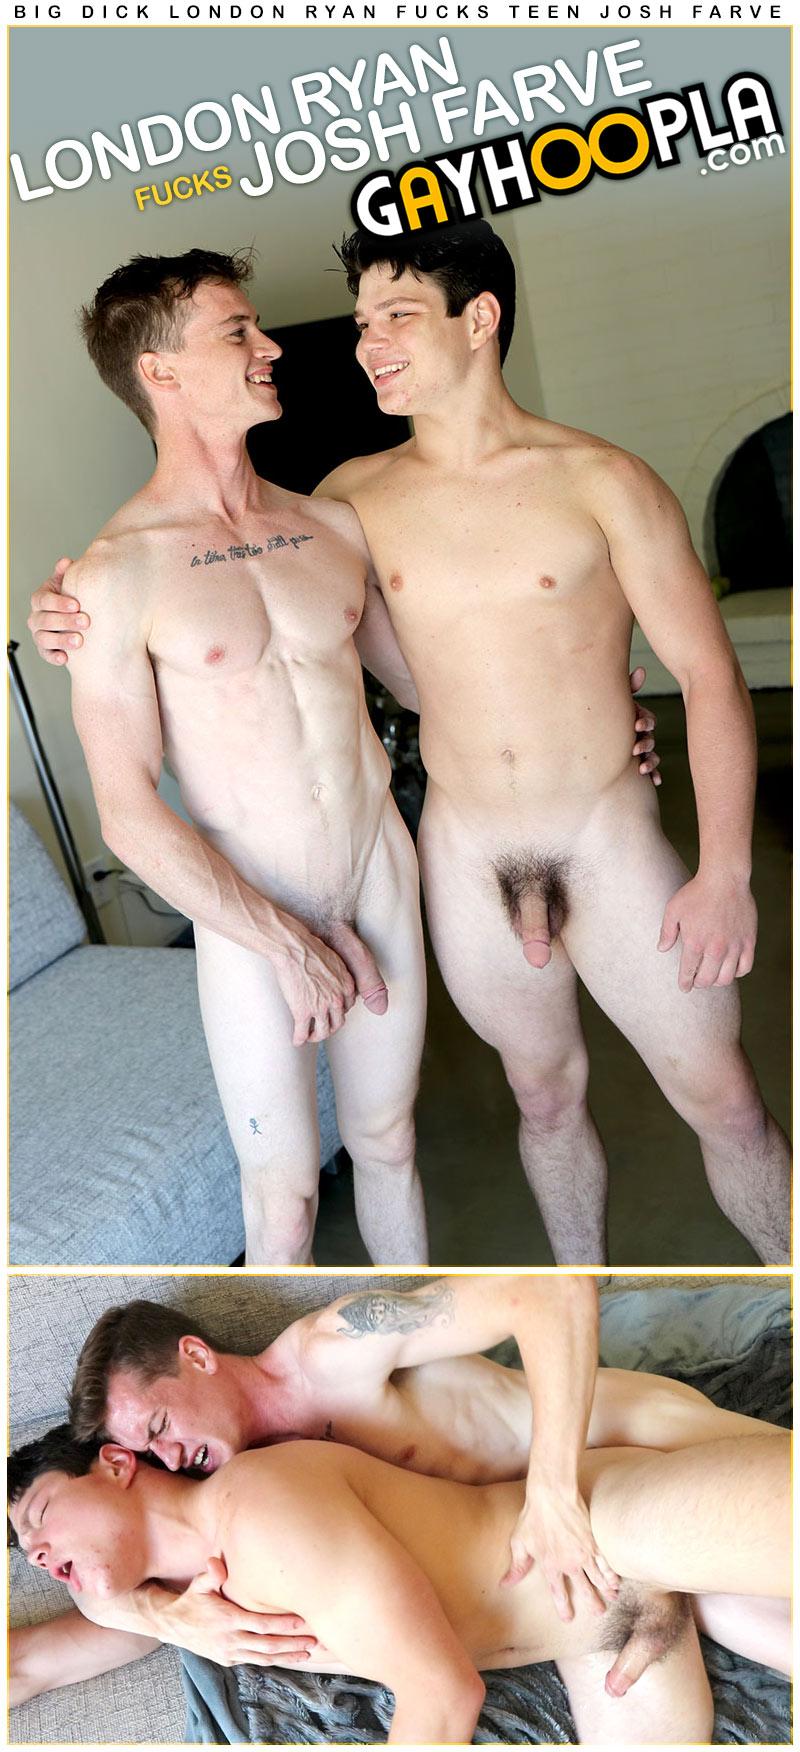 London Ryan Fucks Josh Farve at GayHoopla